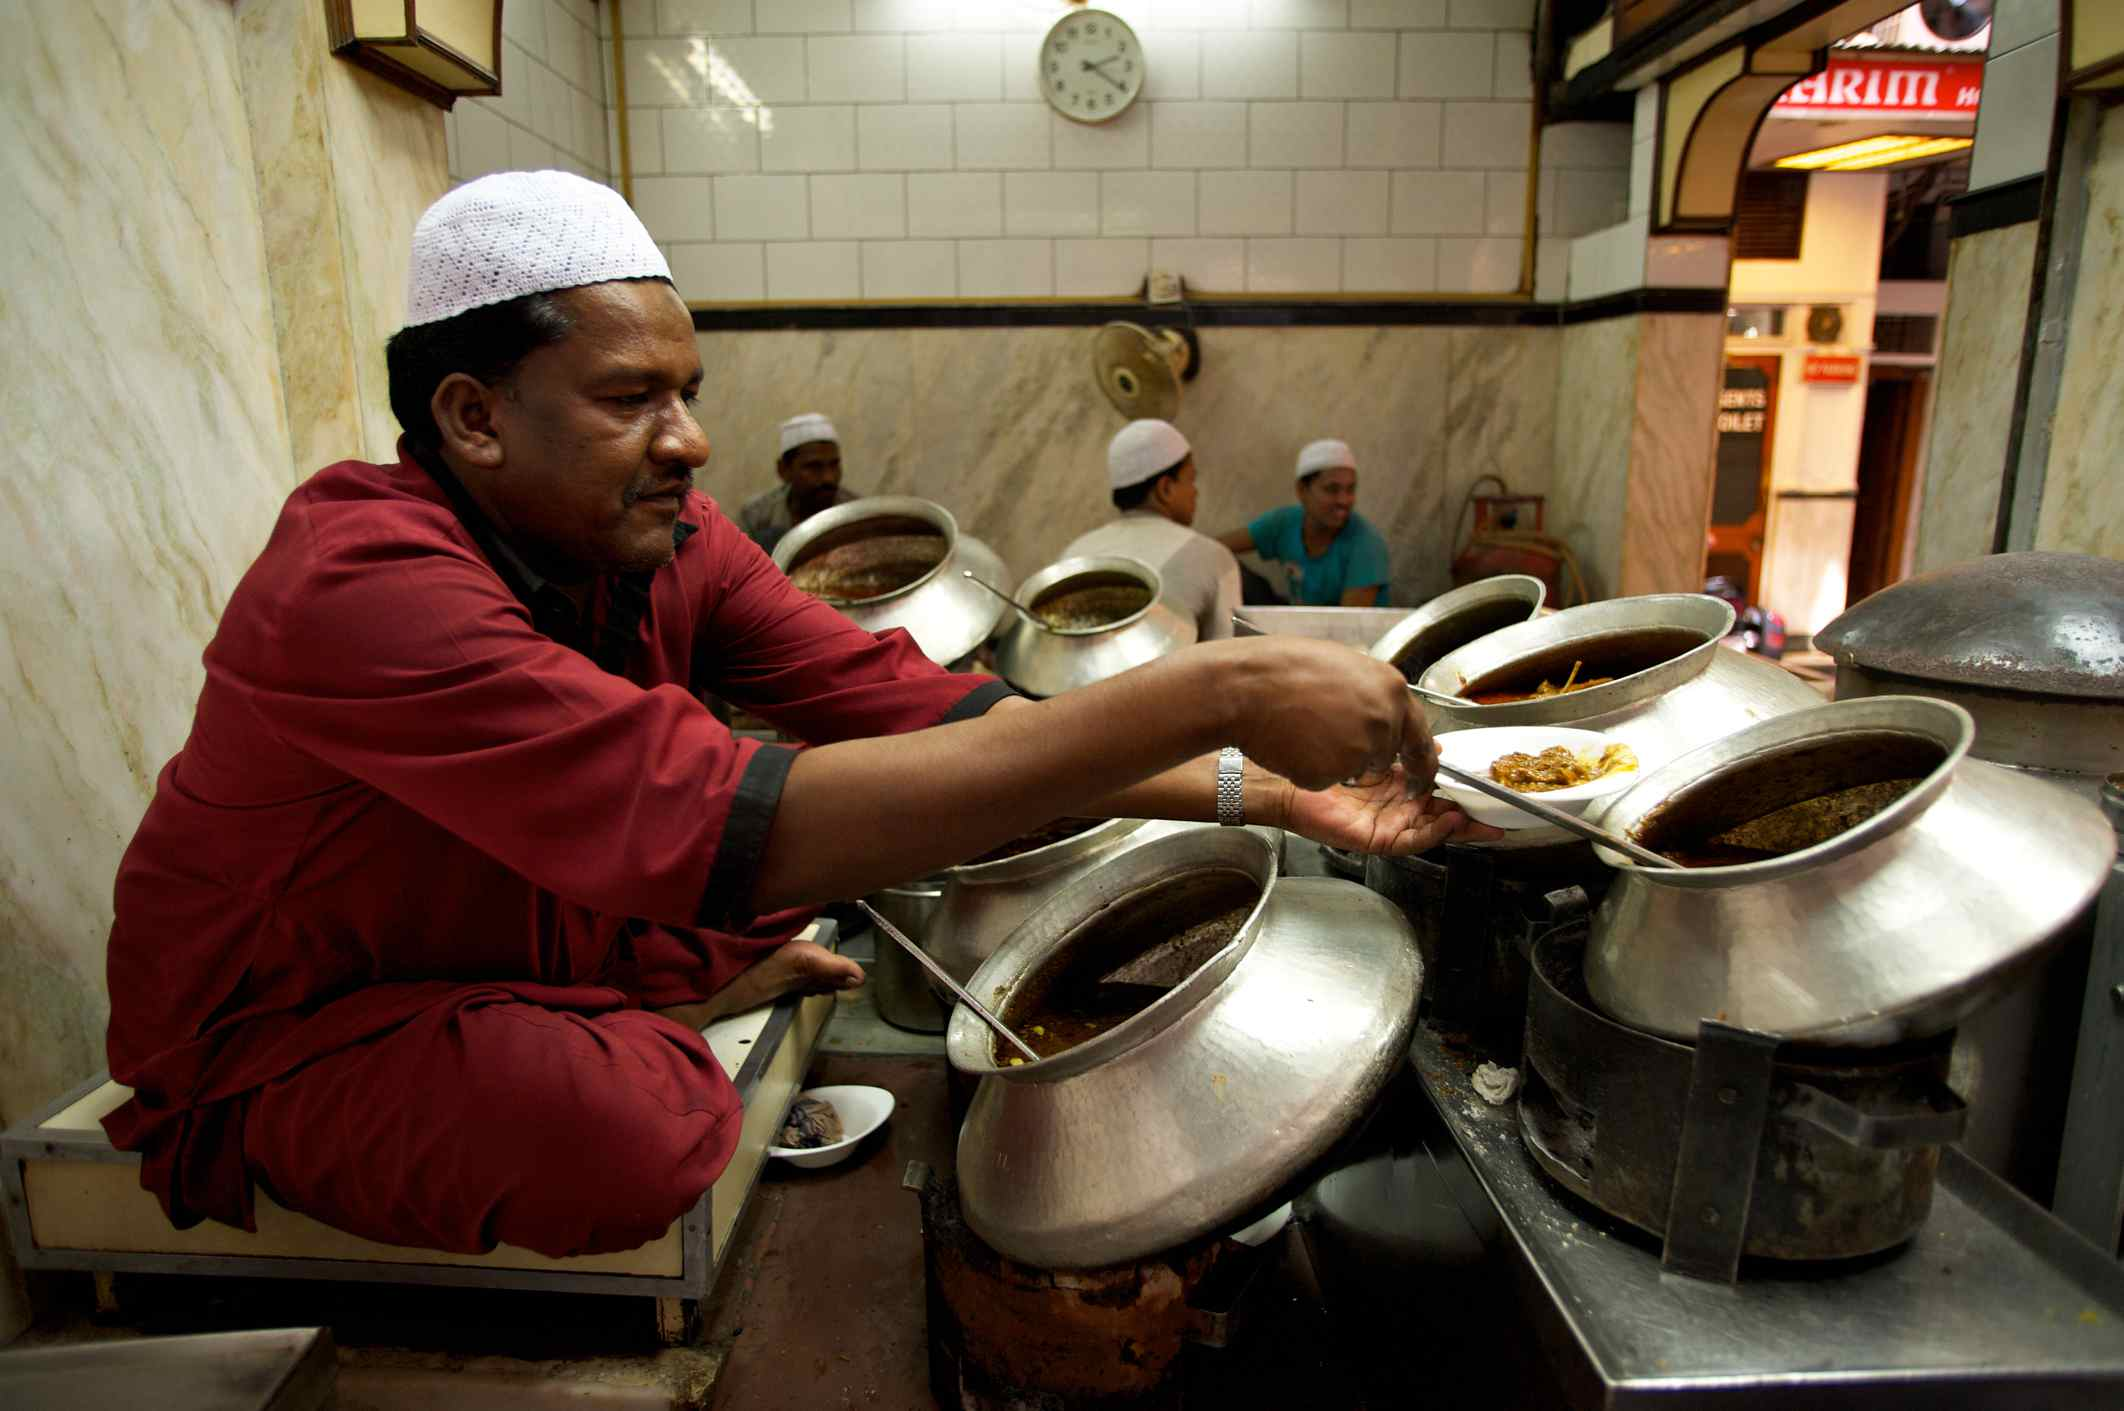 Karim restaurant, just south of Jama Masjid mosque in Old Delhi.